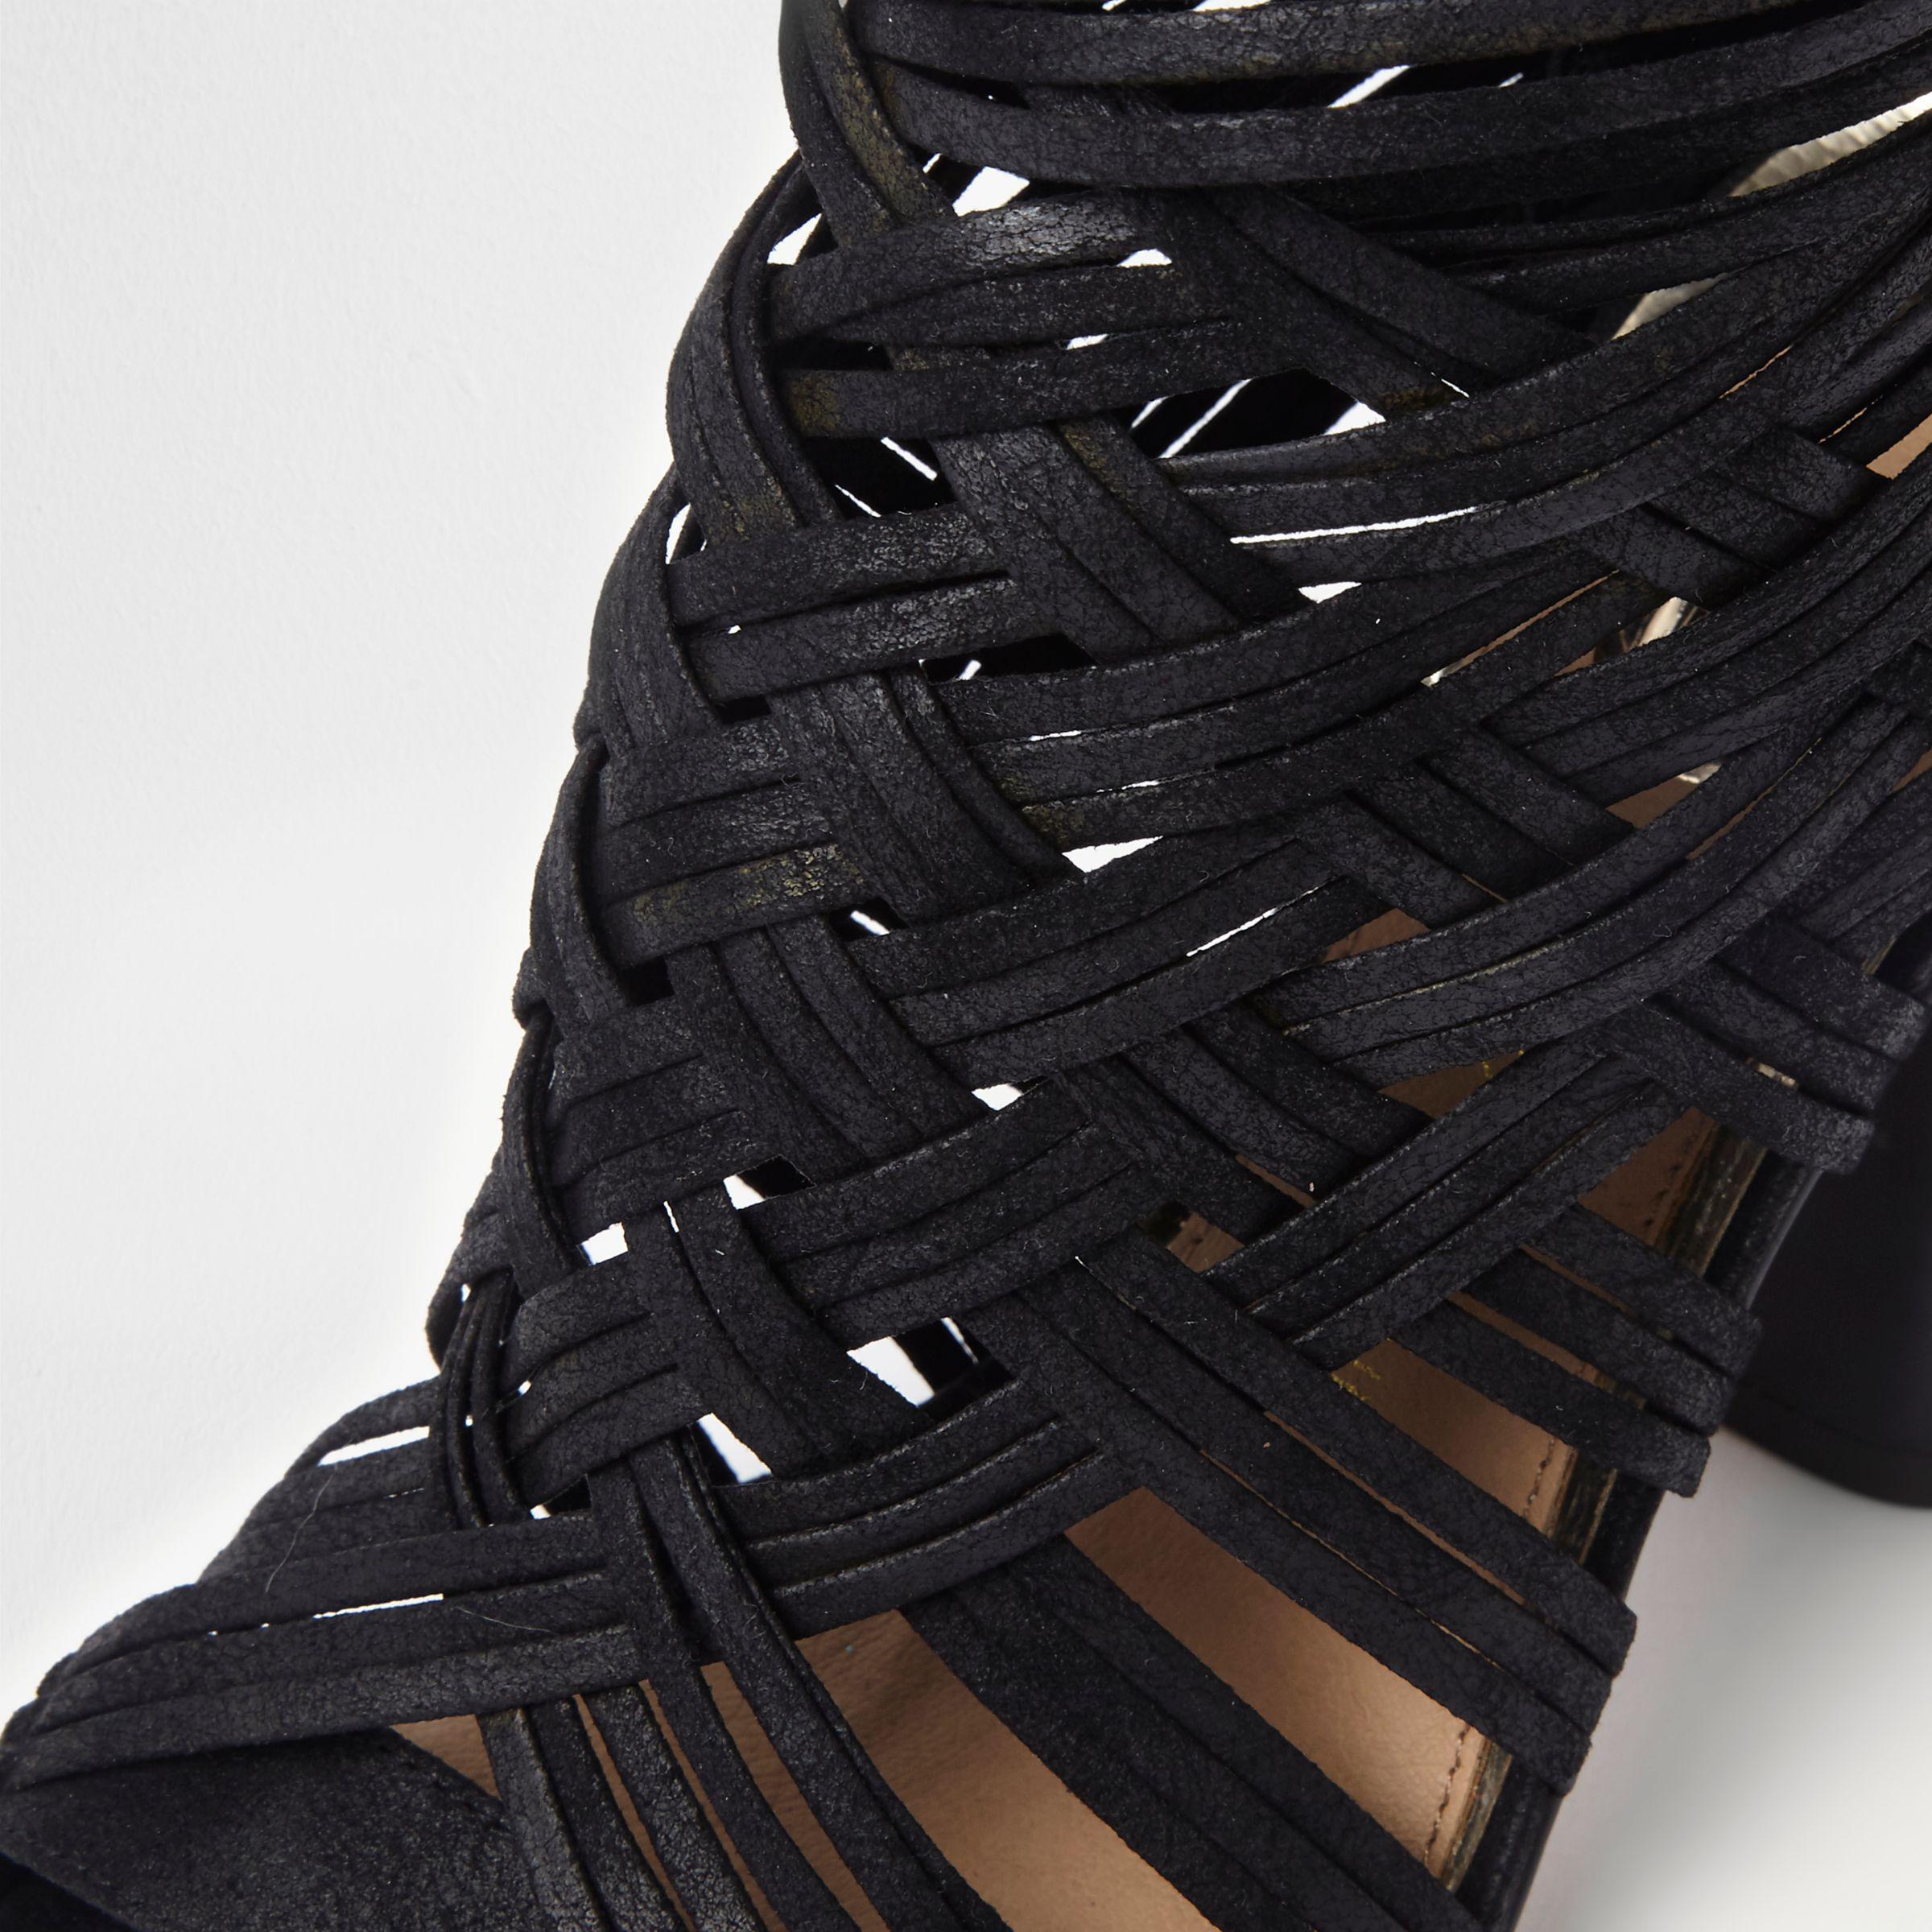 4839df8d8c1b Lyst - River Island Black Lattice Block Heel Shoe Boots in Black